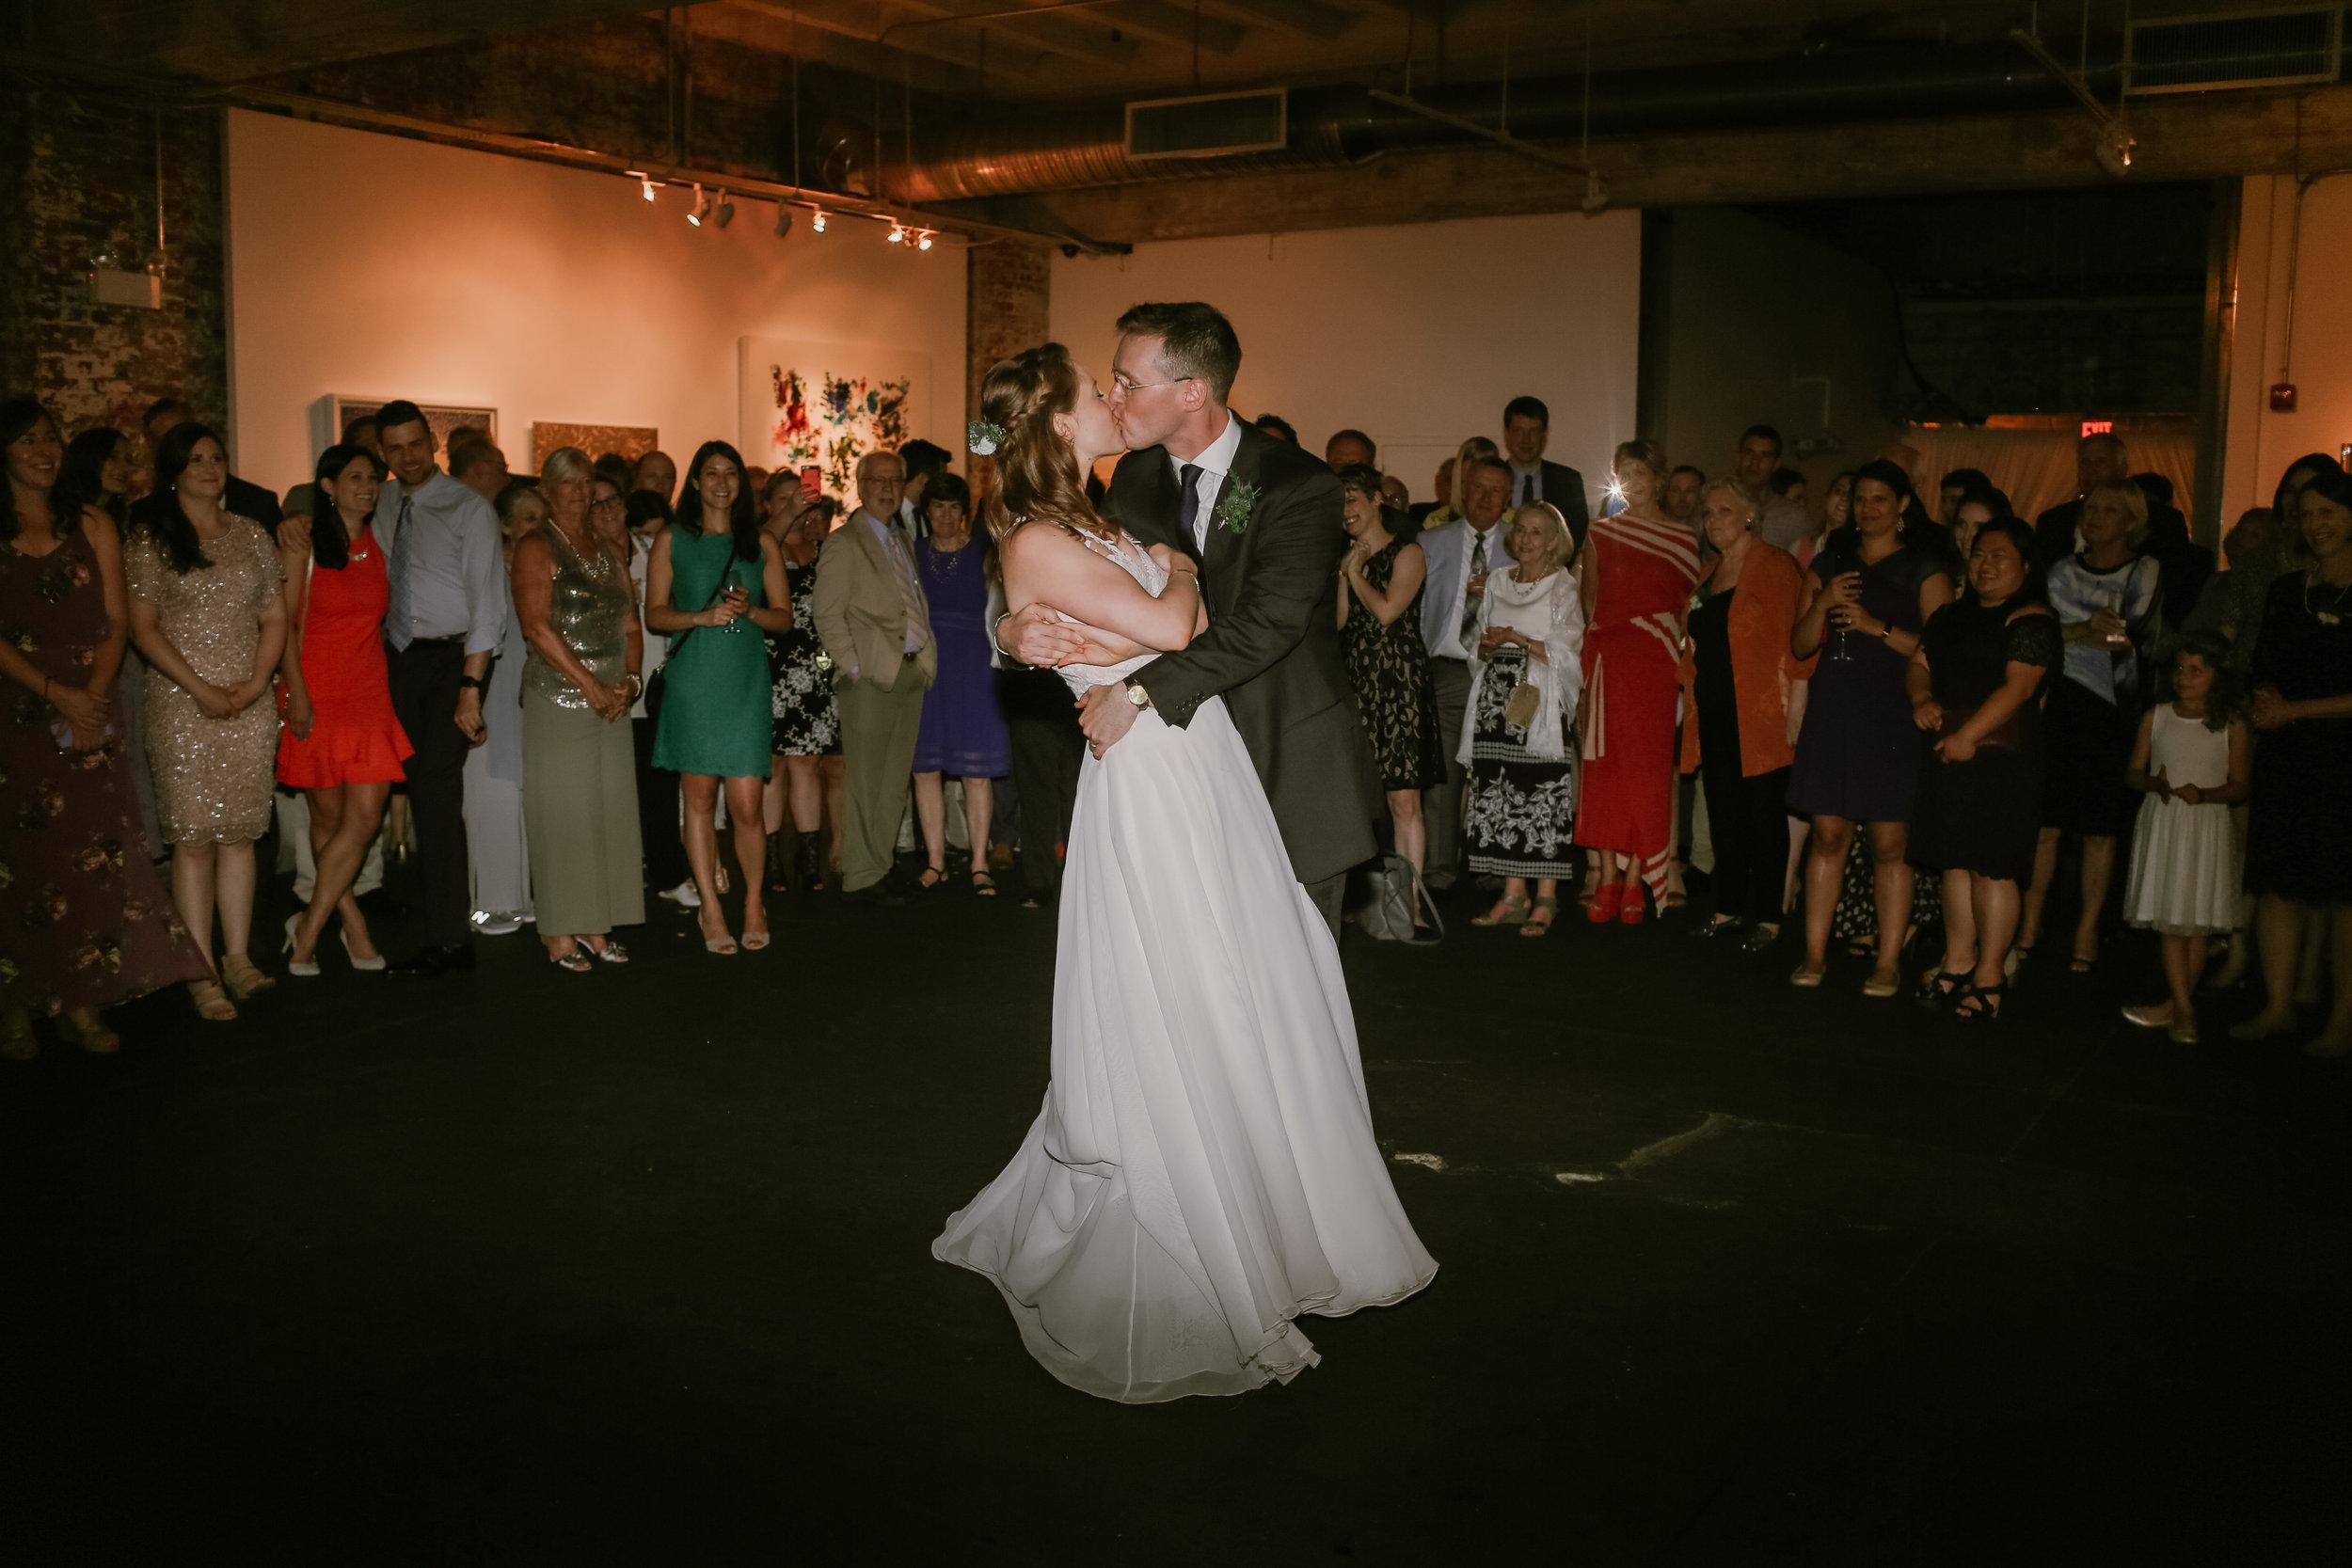 longview gallery wedding